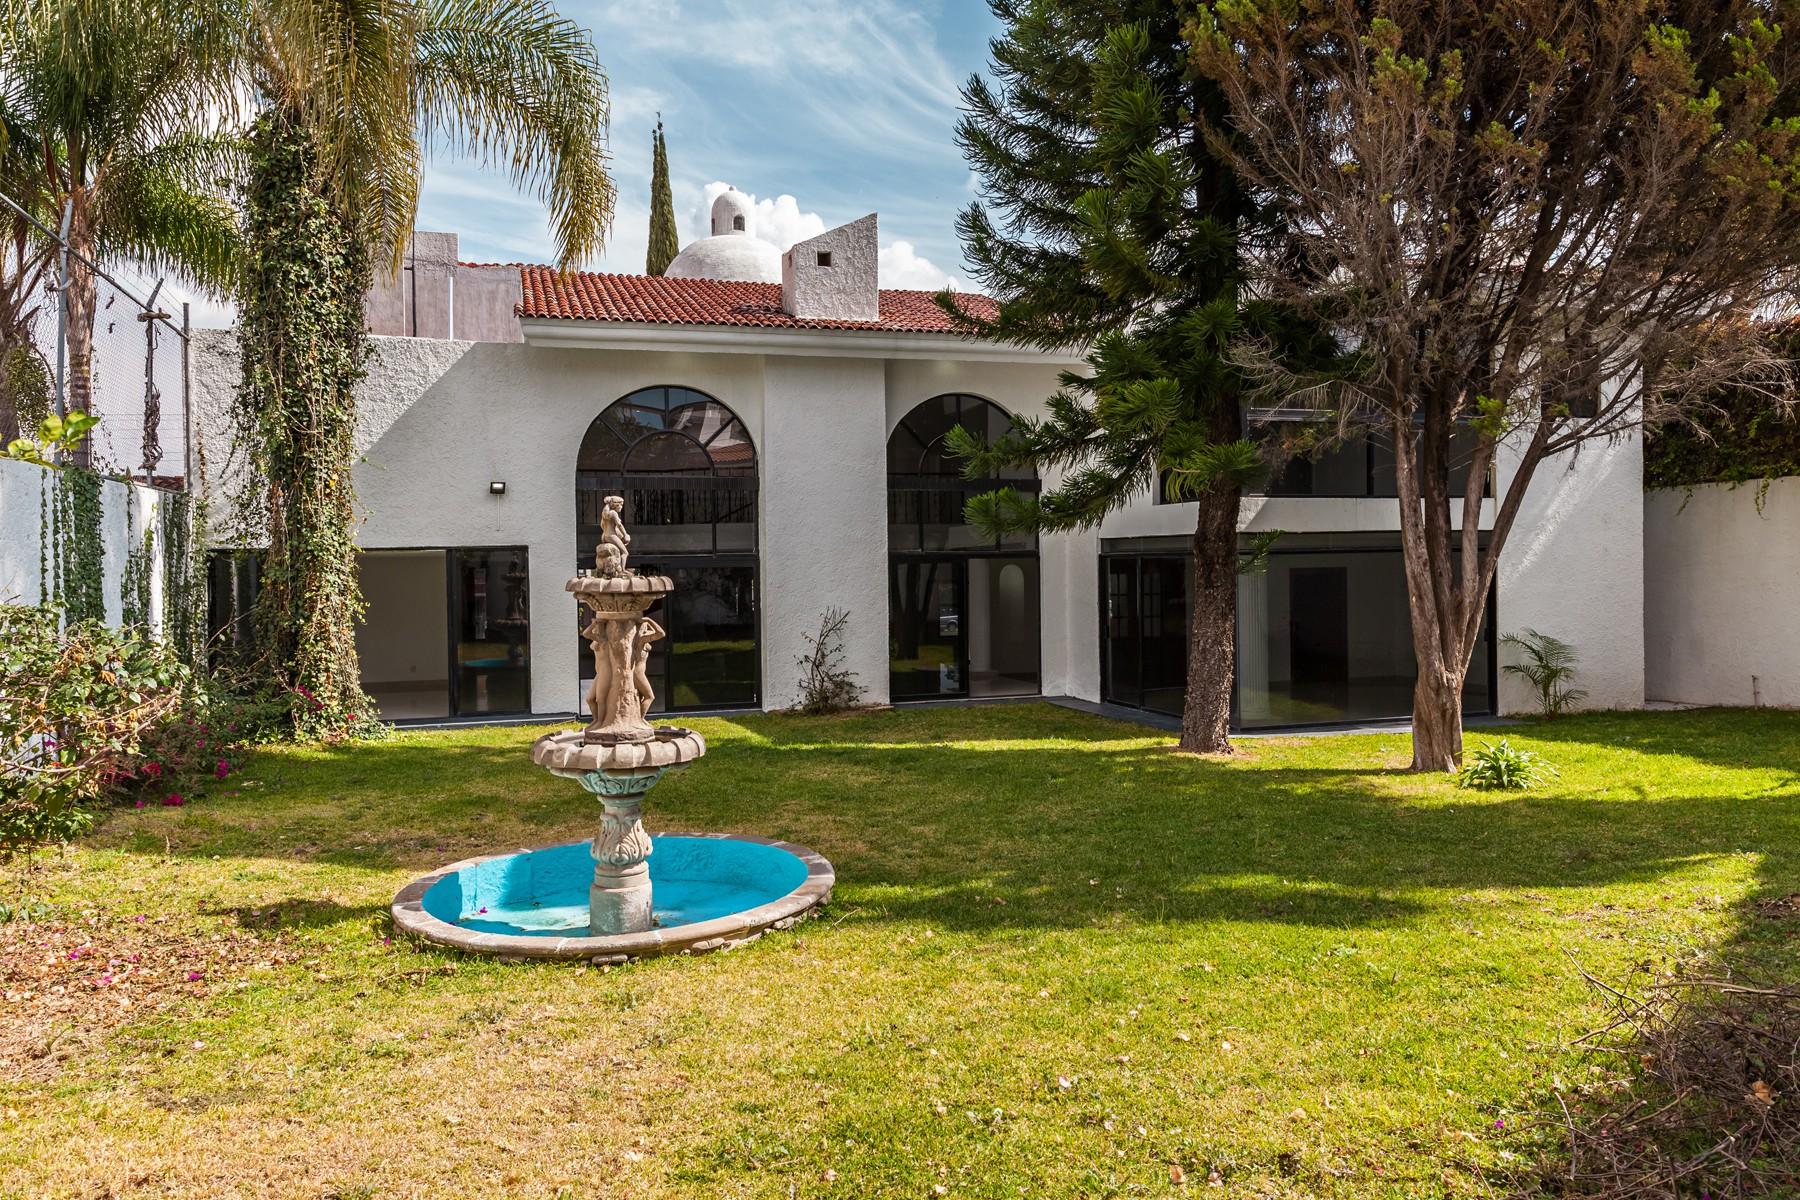 Additional photo for property listing at Residencia Paseo del Iris Zapopan, Jalisco Mexico